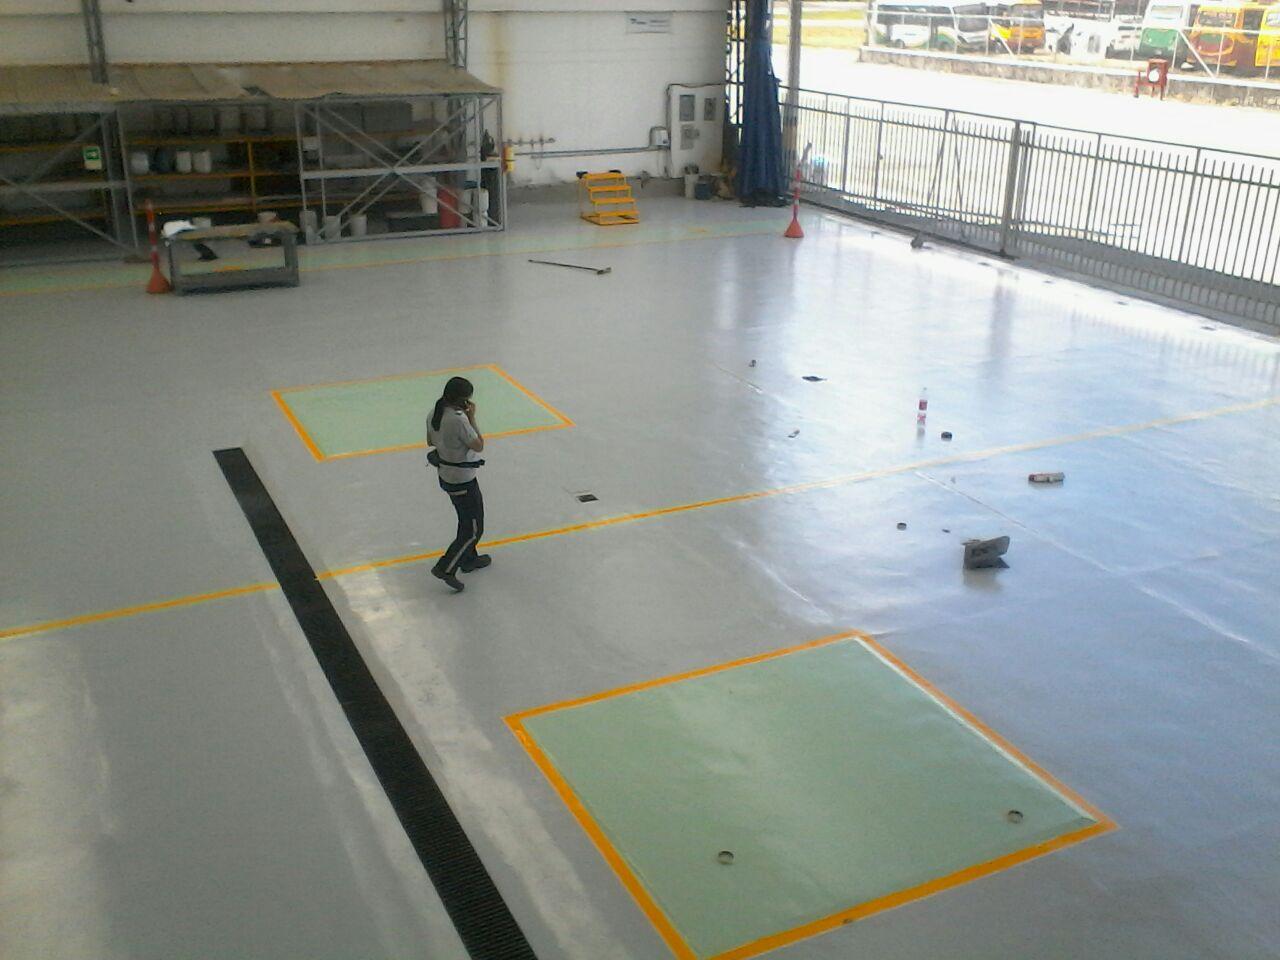 Pisos industriales pintura ep xica para hangar - Pintura para mosaicos piso ...